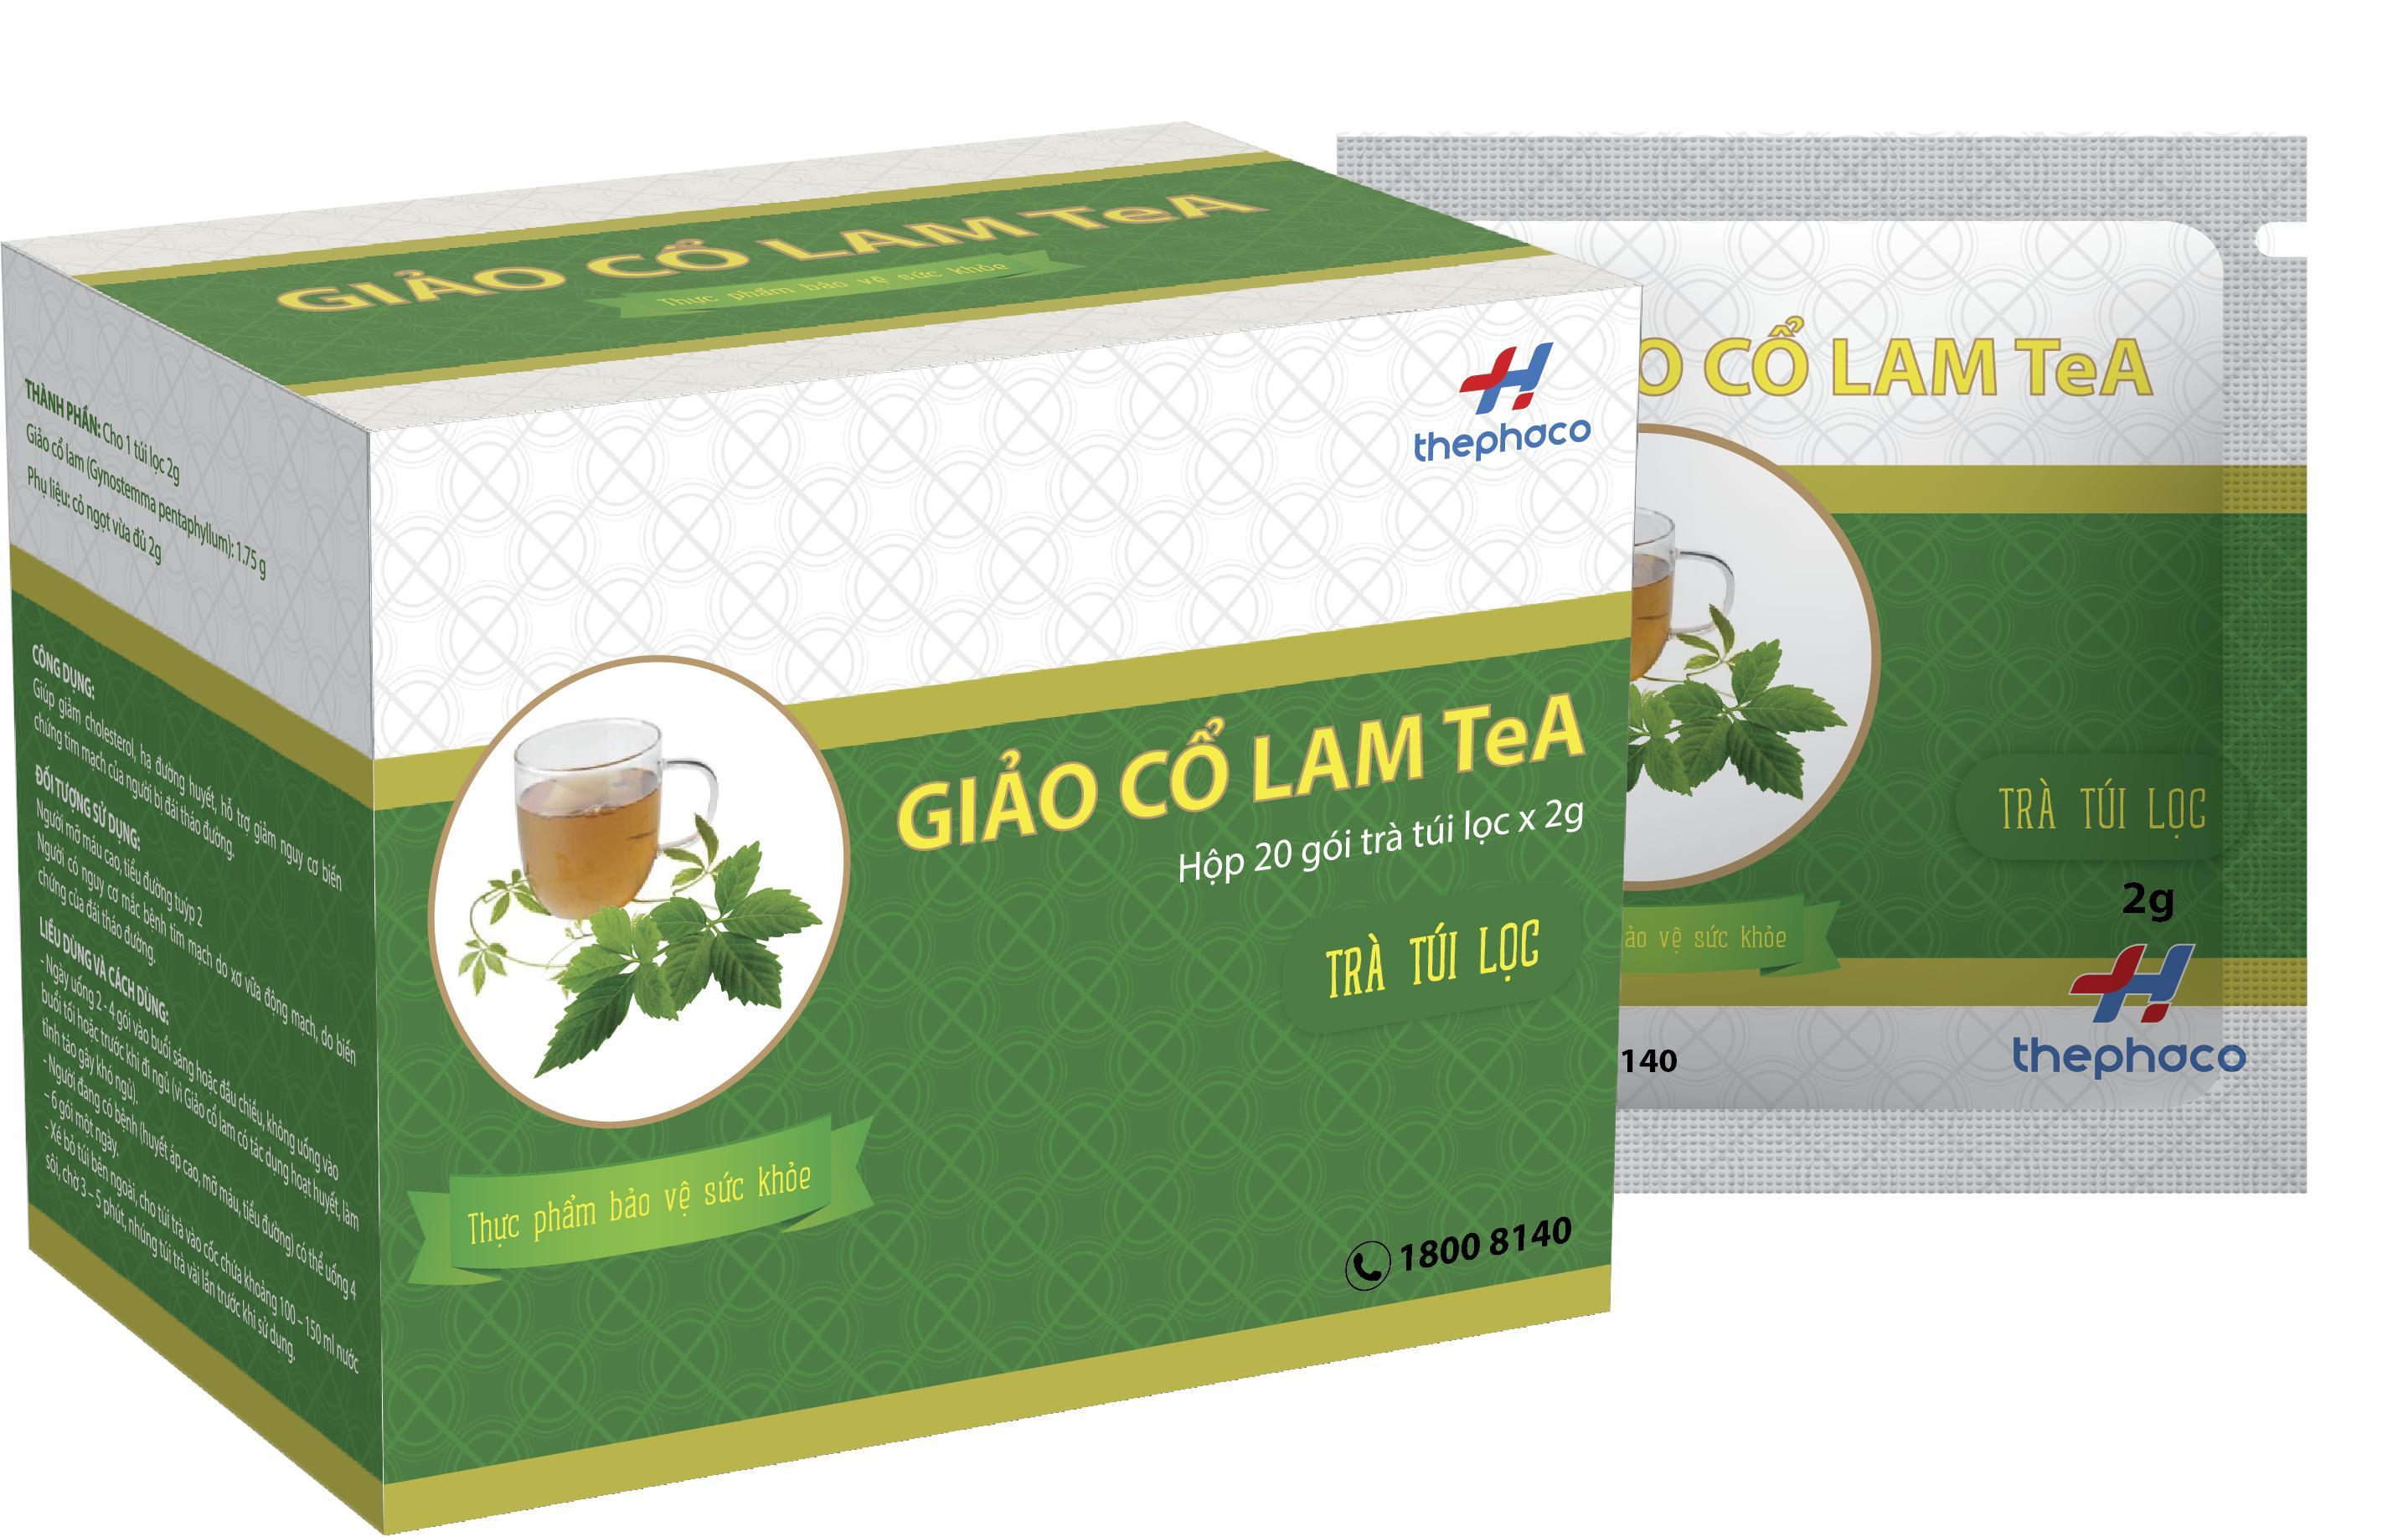 GIẢO CỔ LAM TEA